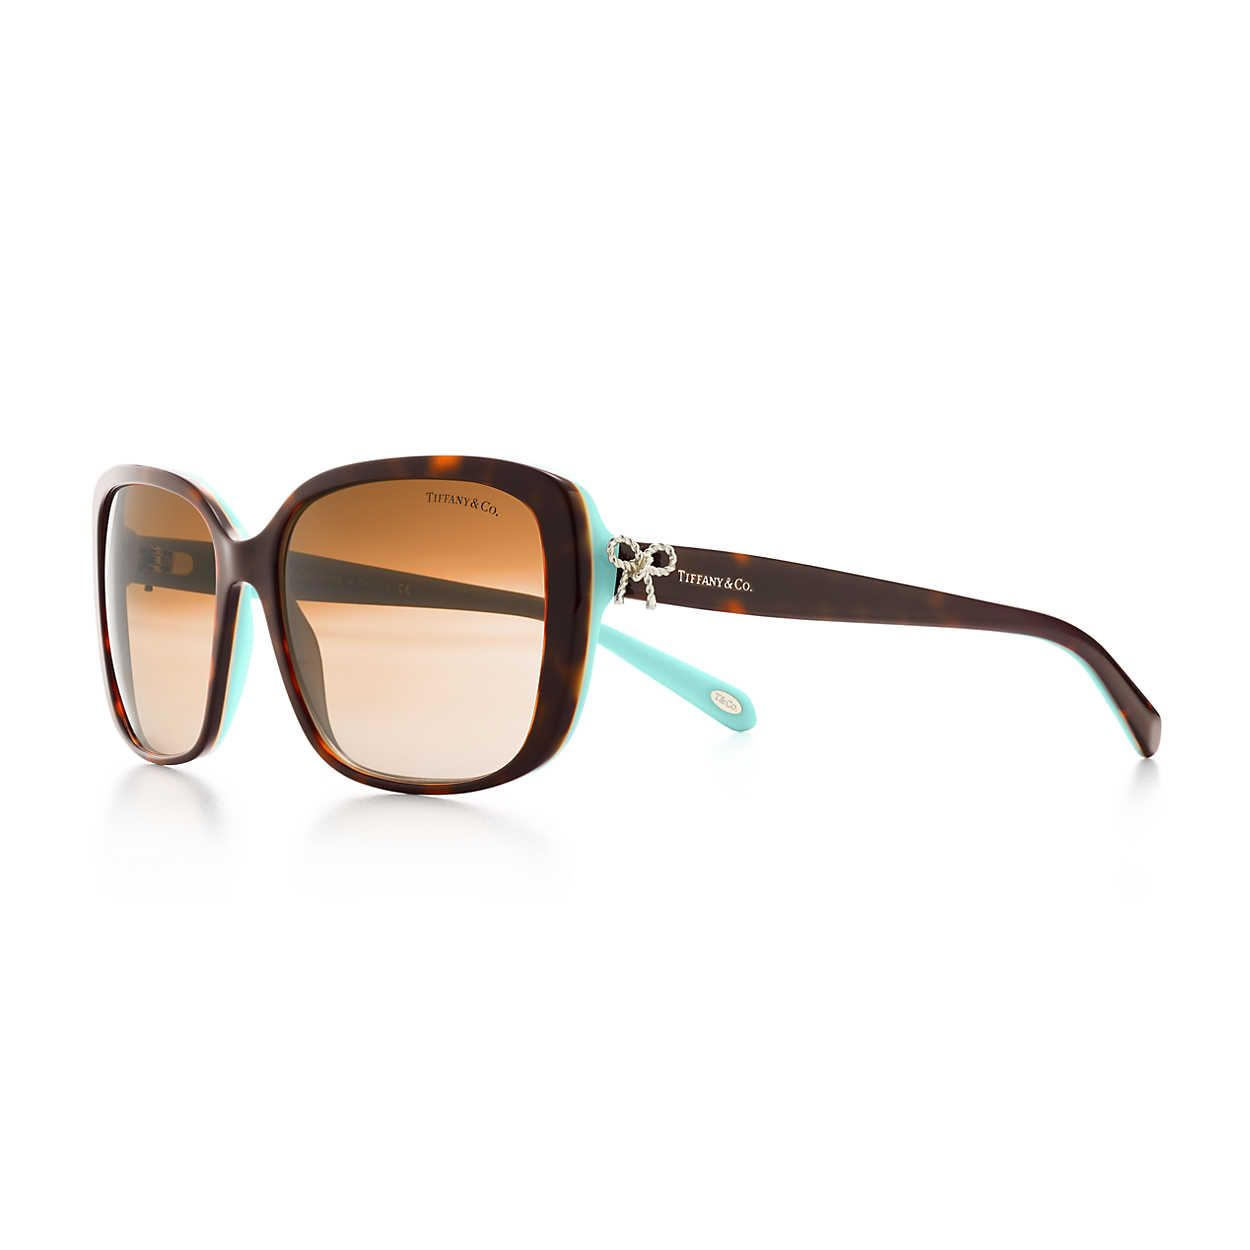 0e679ab78bc Tiffany Twist Square Bow Sunglasses